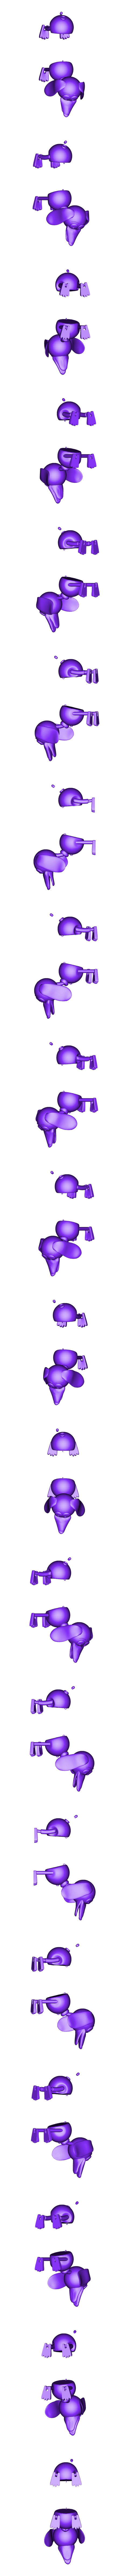 full_body.stl Download free STL file Slinky [Toy Story] • 3D printable model, Dream_it_Model_it